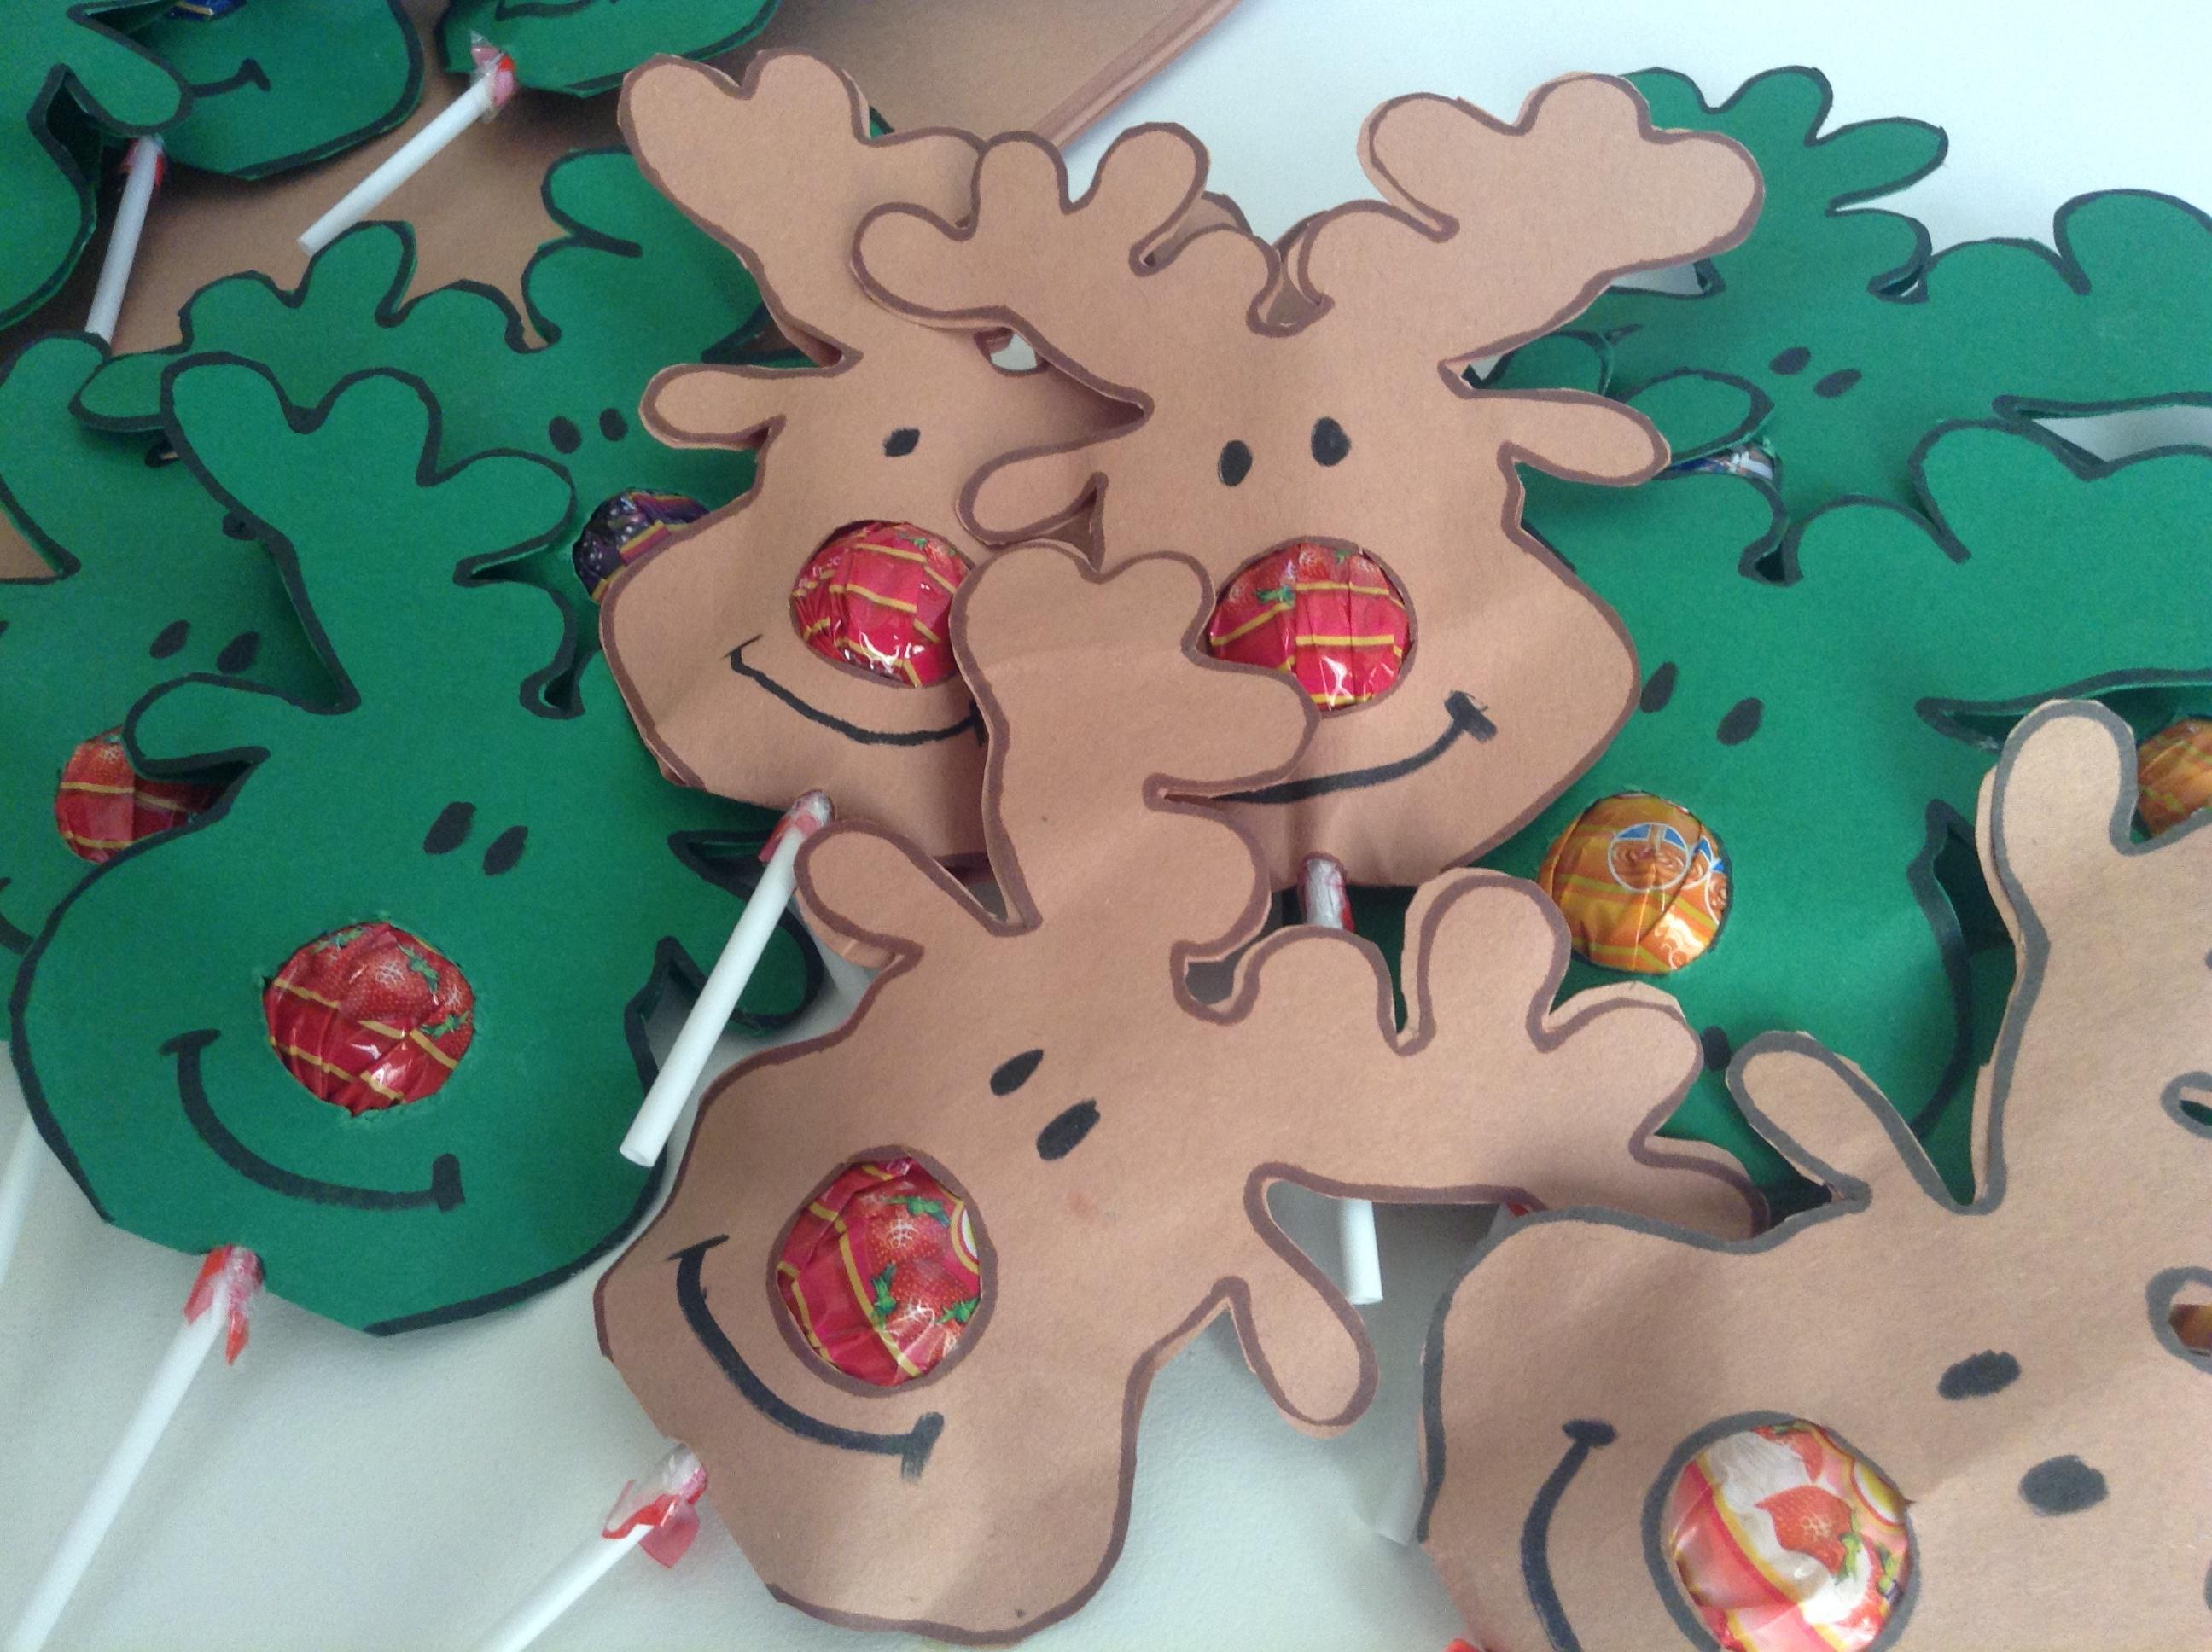 Christmas Gift -Reindeer Nose Lollipops - Free Printable Reindeer Lollipop Template